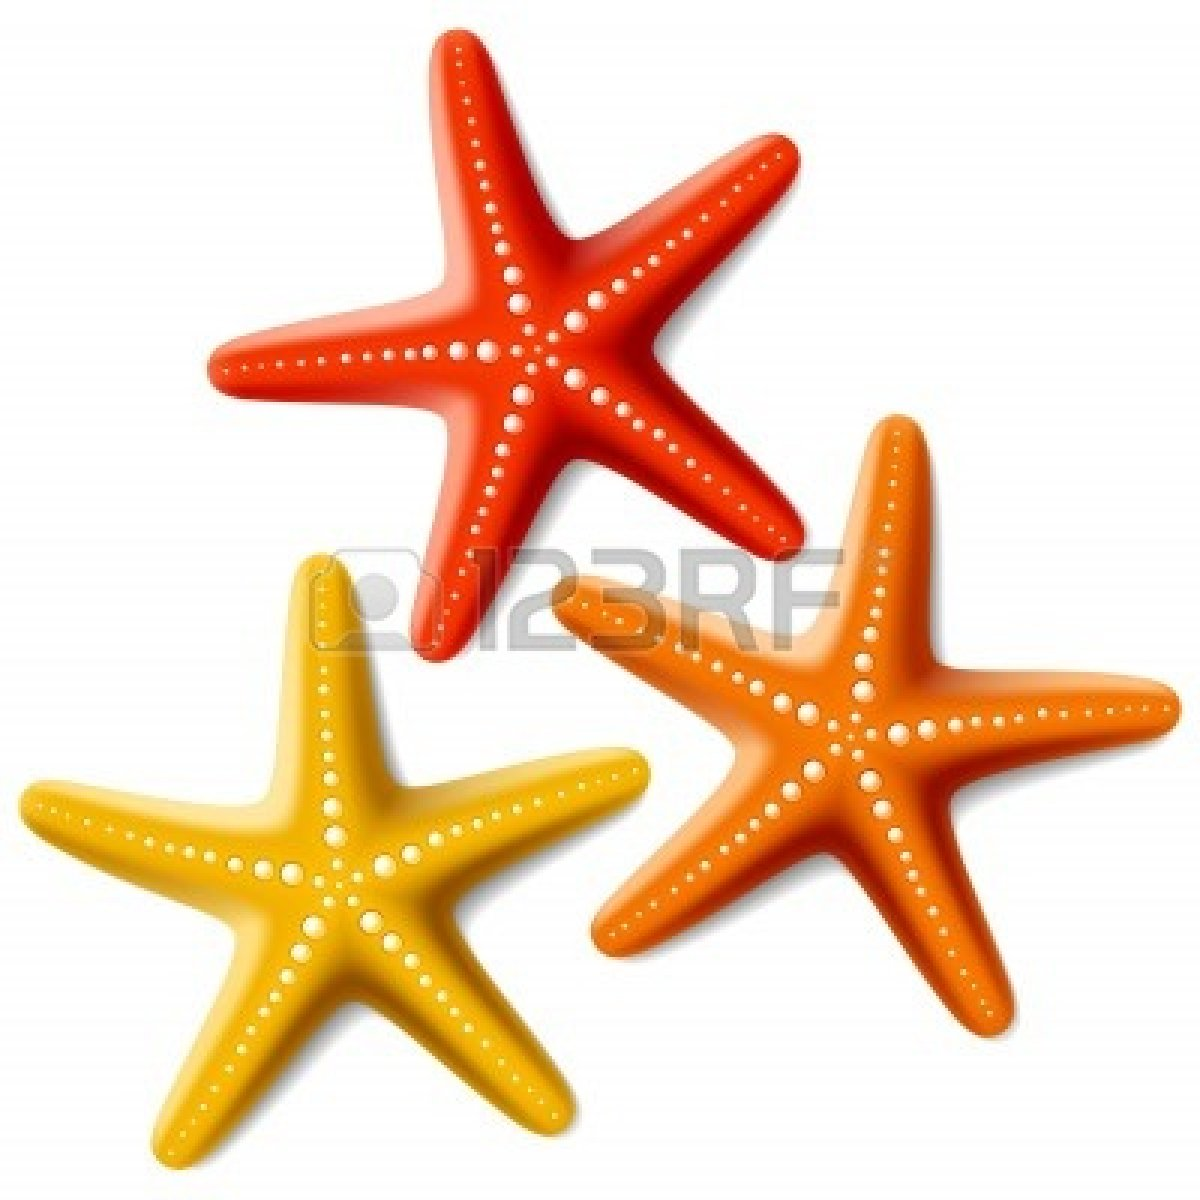 3 clipart starfish. Cute panda free images